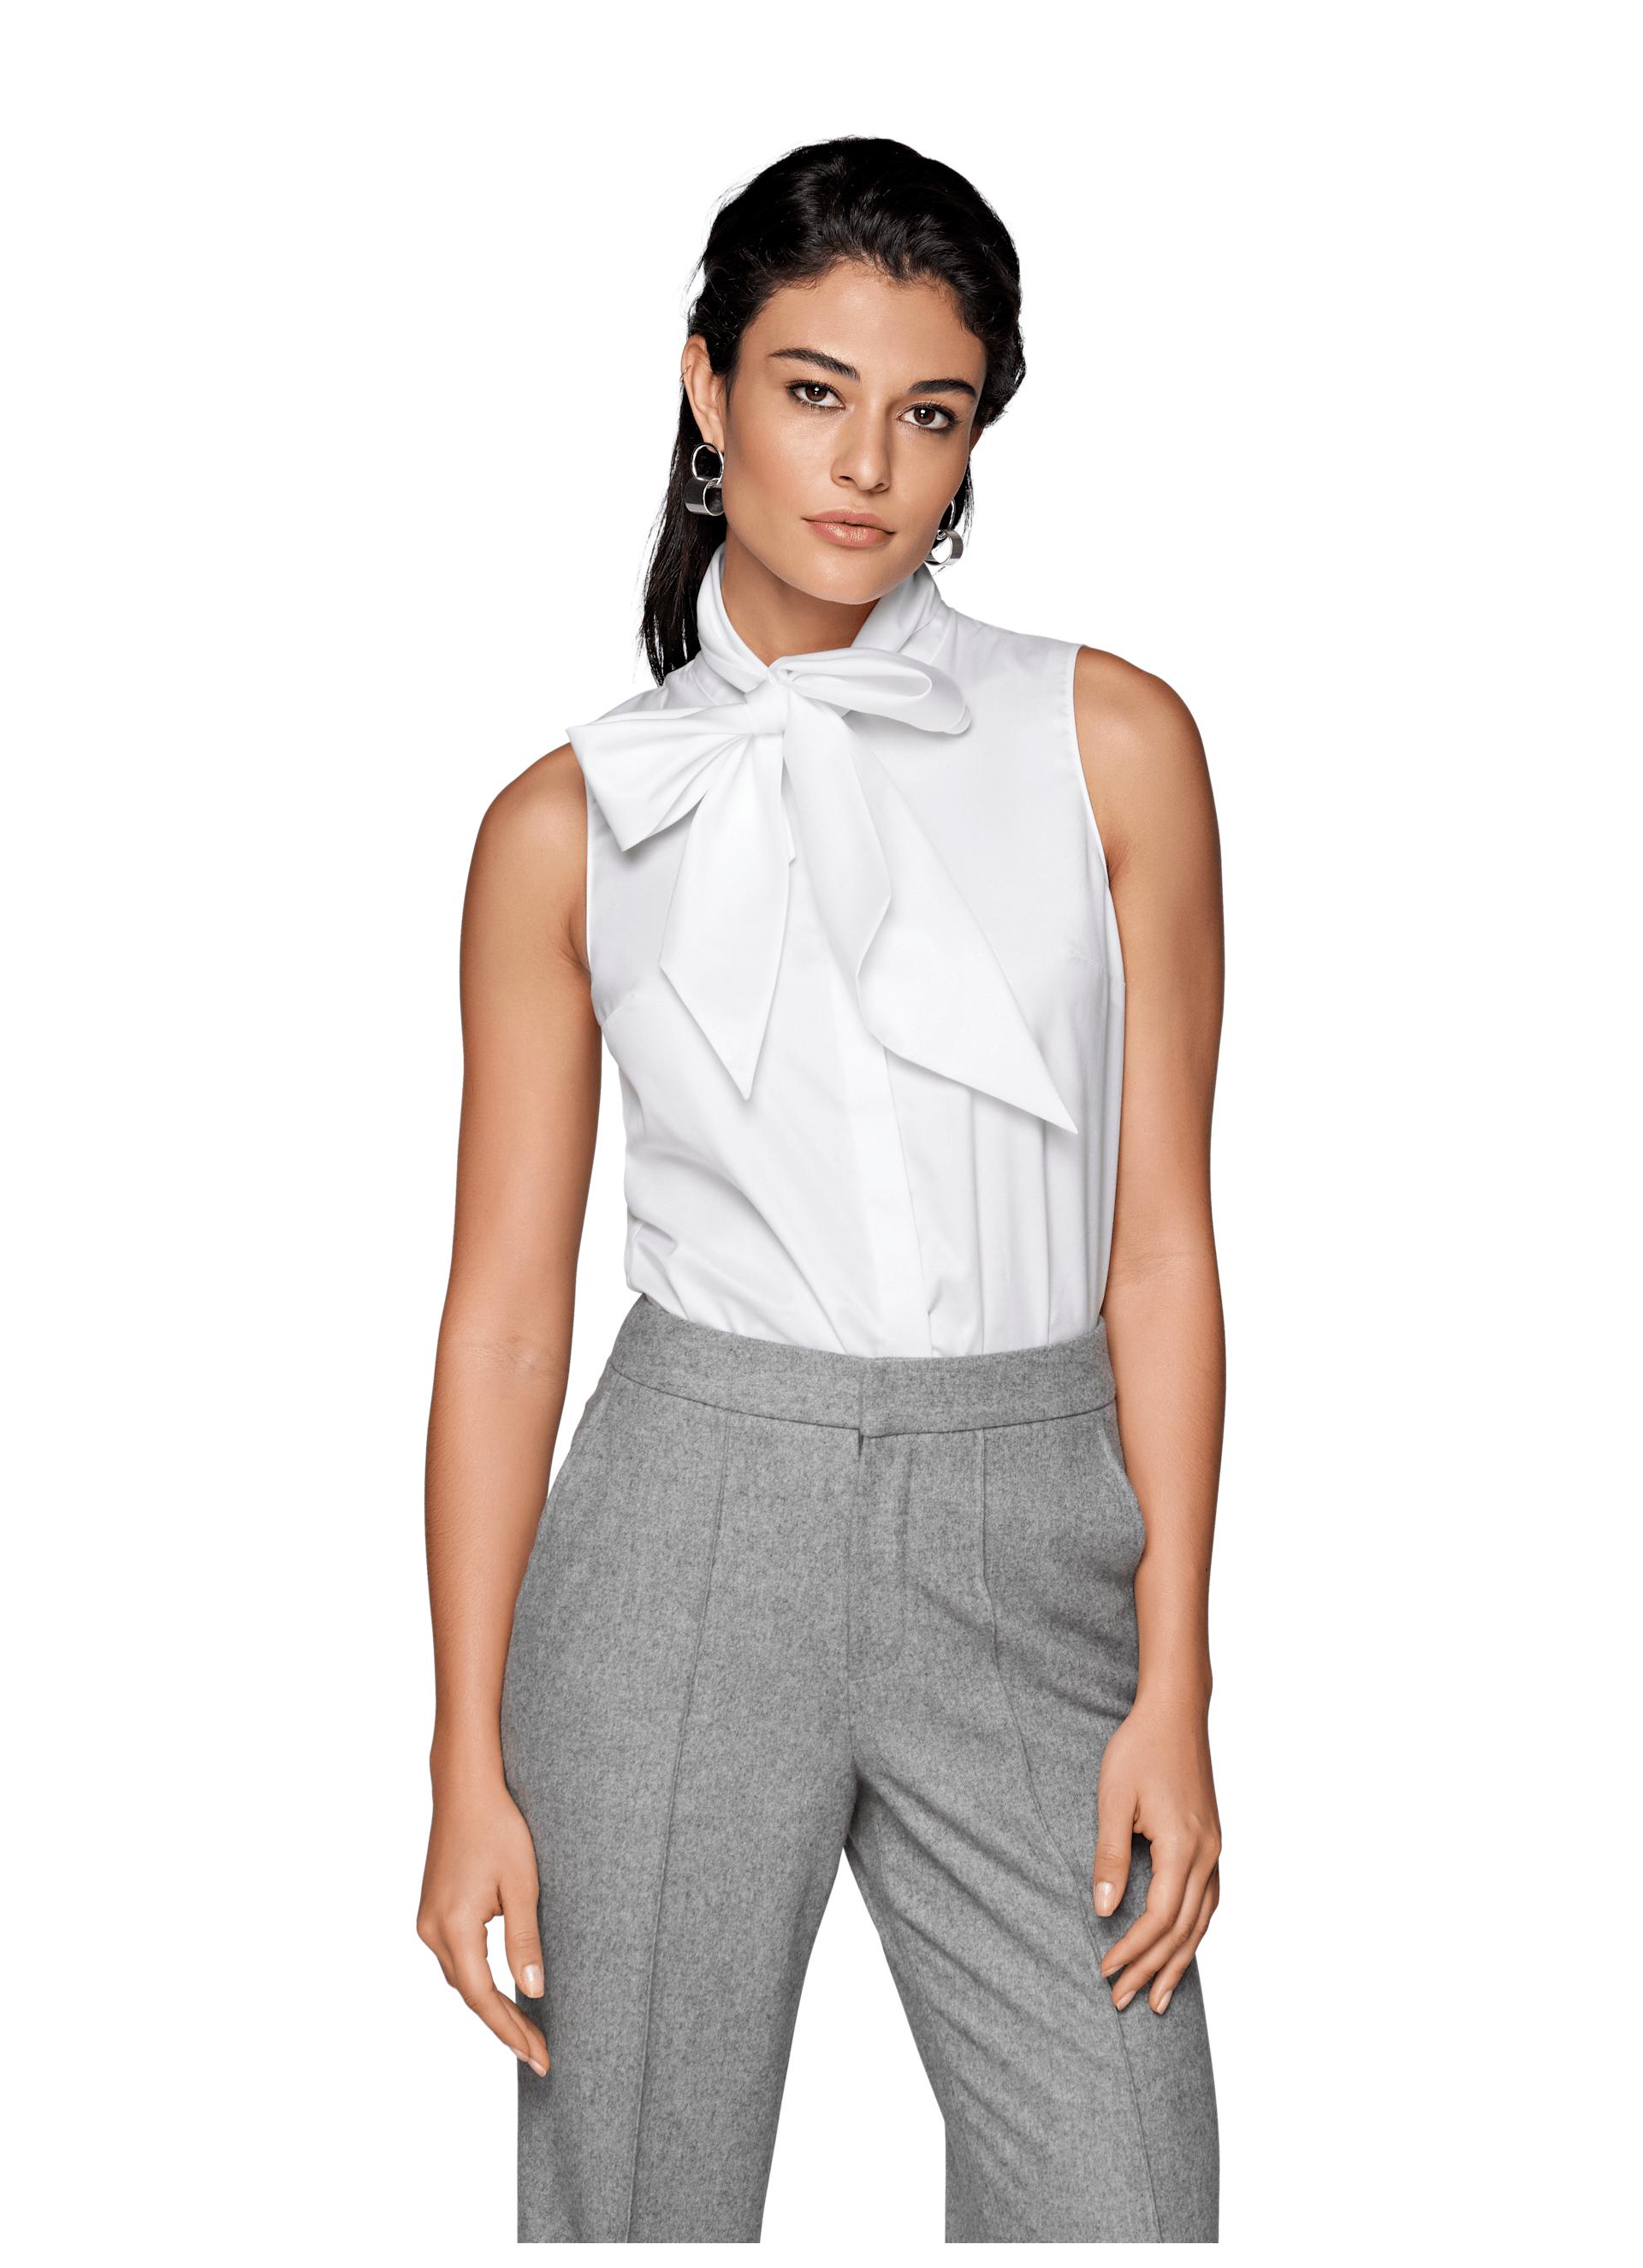 White Bow Shirt Ls0074 Suistudio Online Store